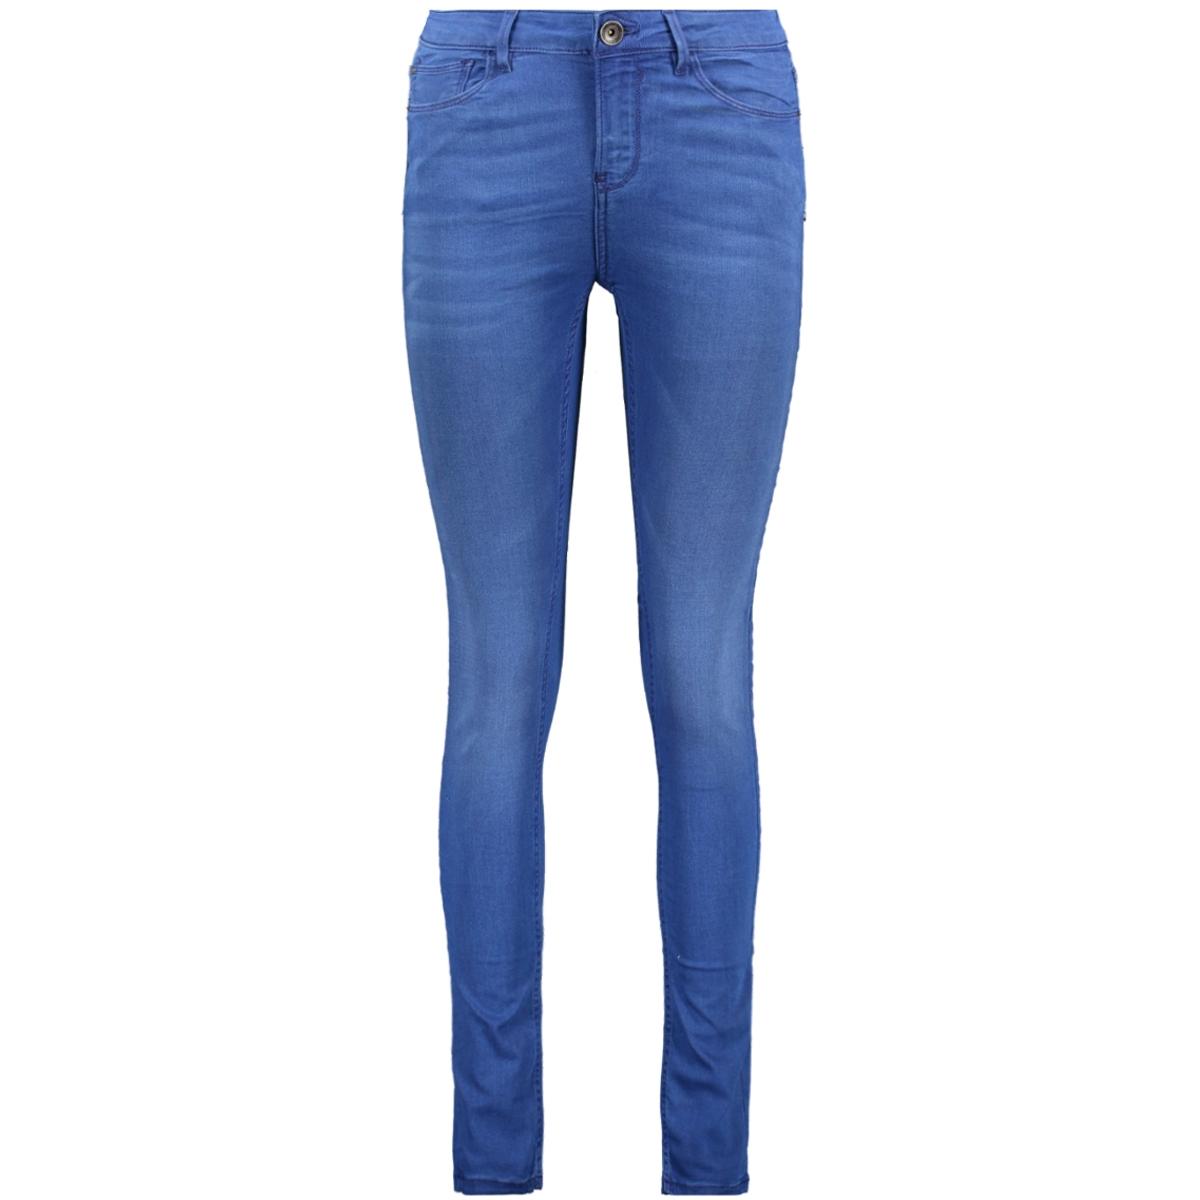 244 celia superslim garcia jeans 2676 sky denim medium used